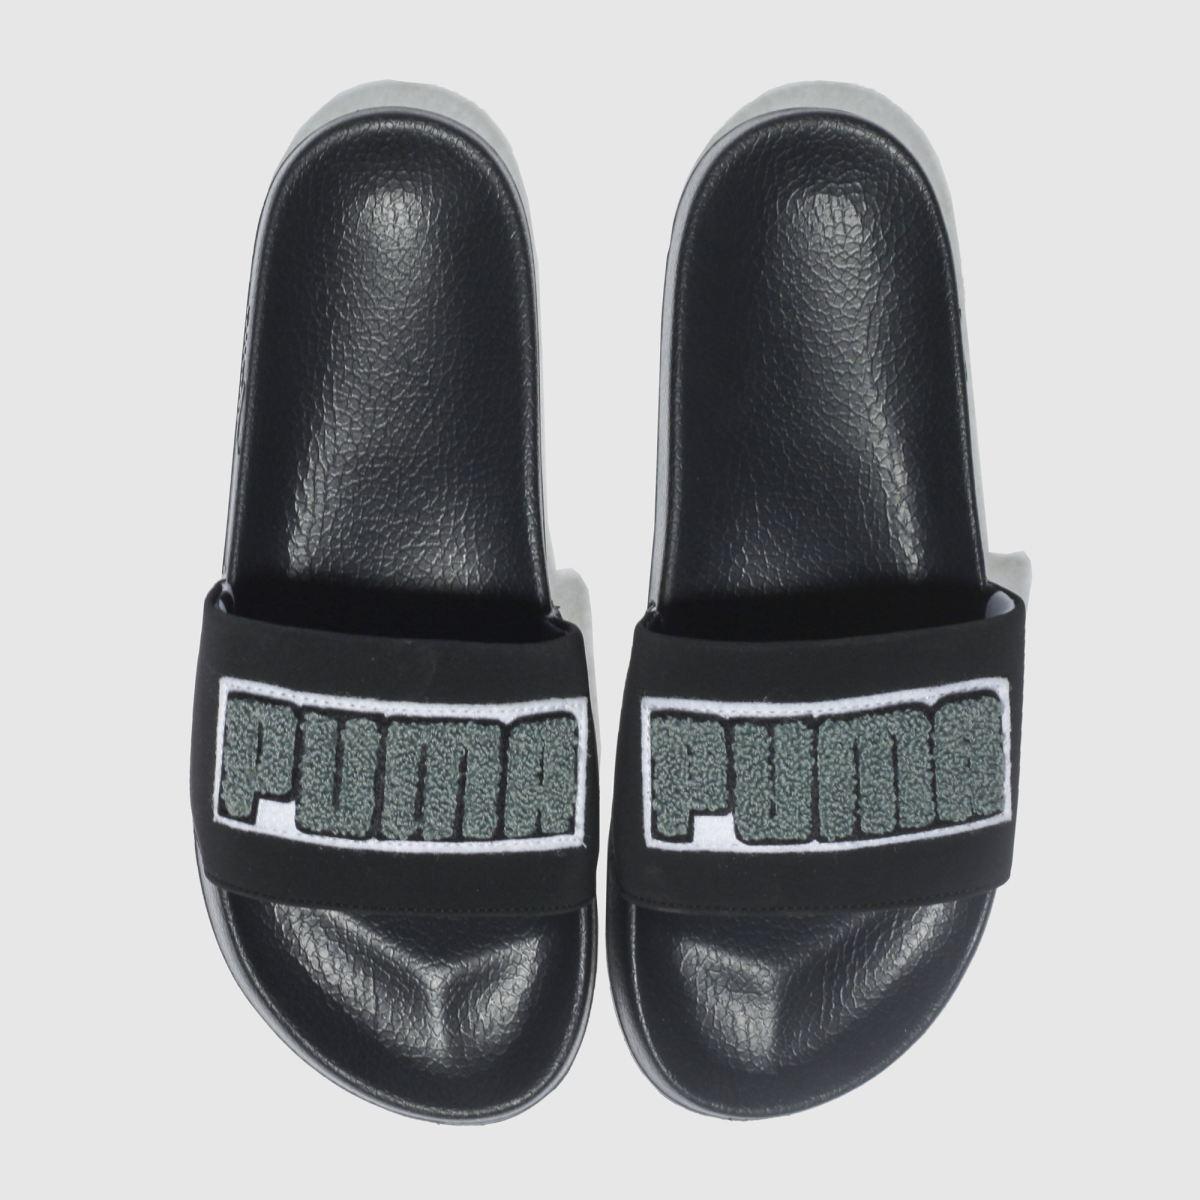 Puma Black Leadcat Nsk Sandals